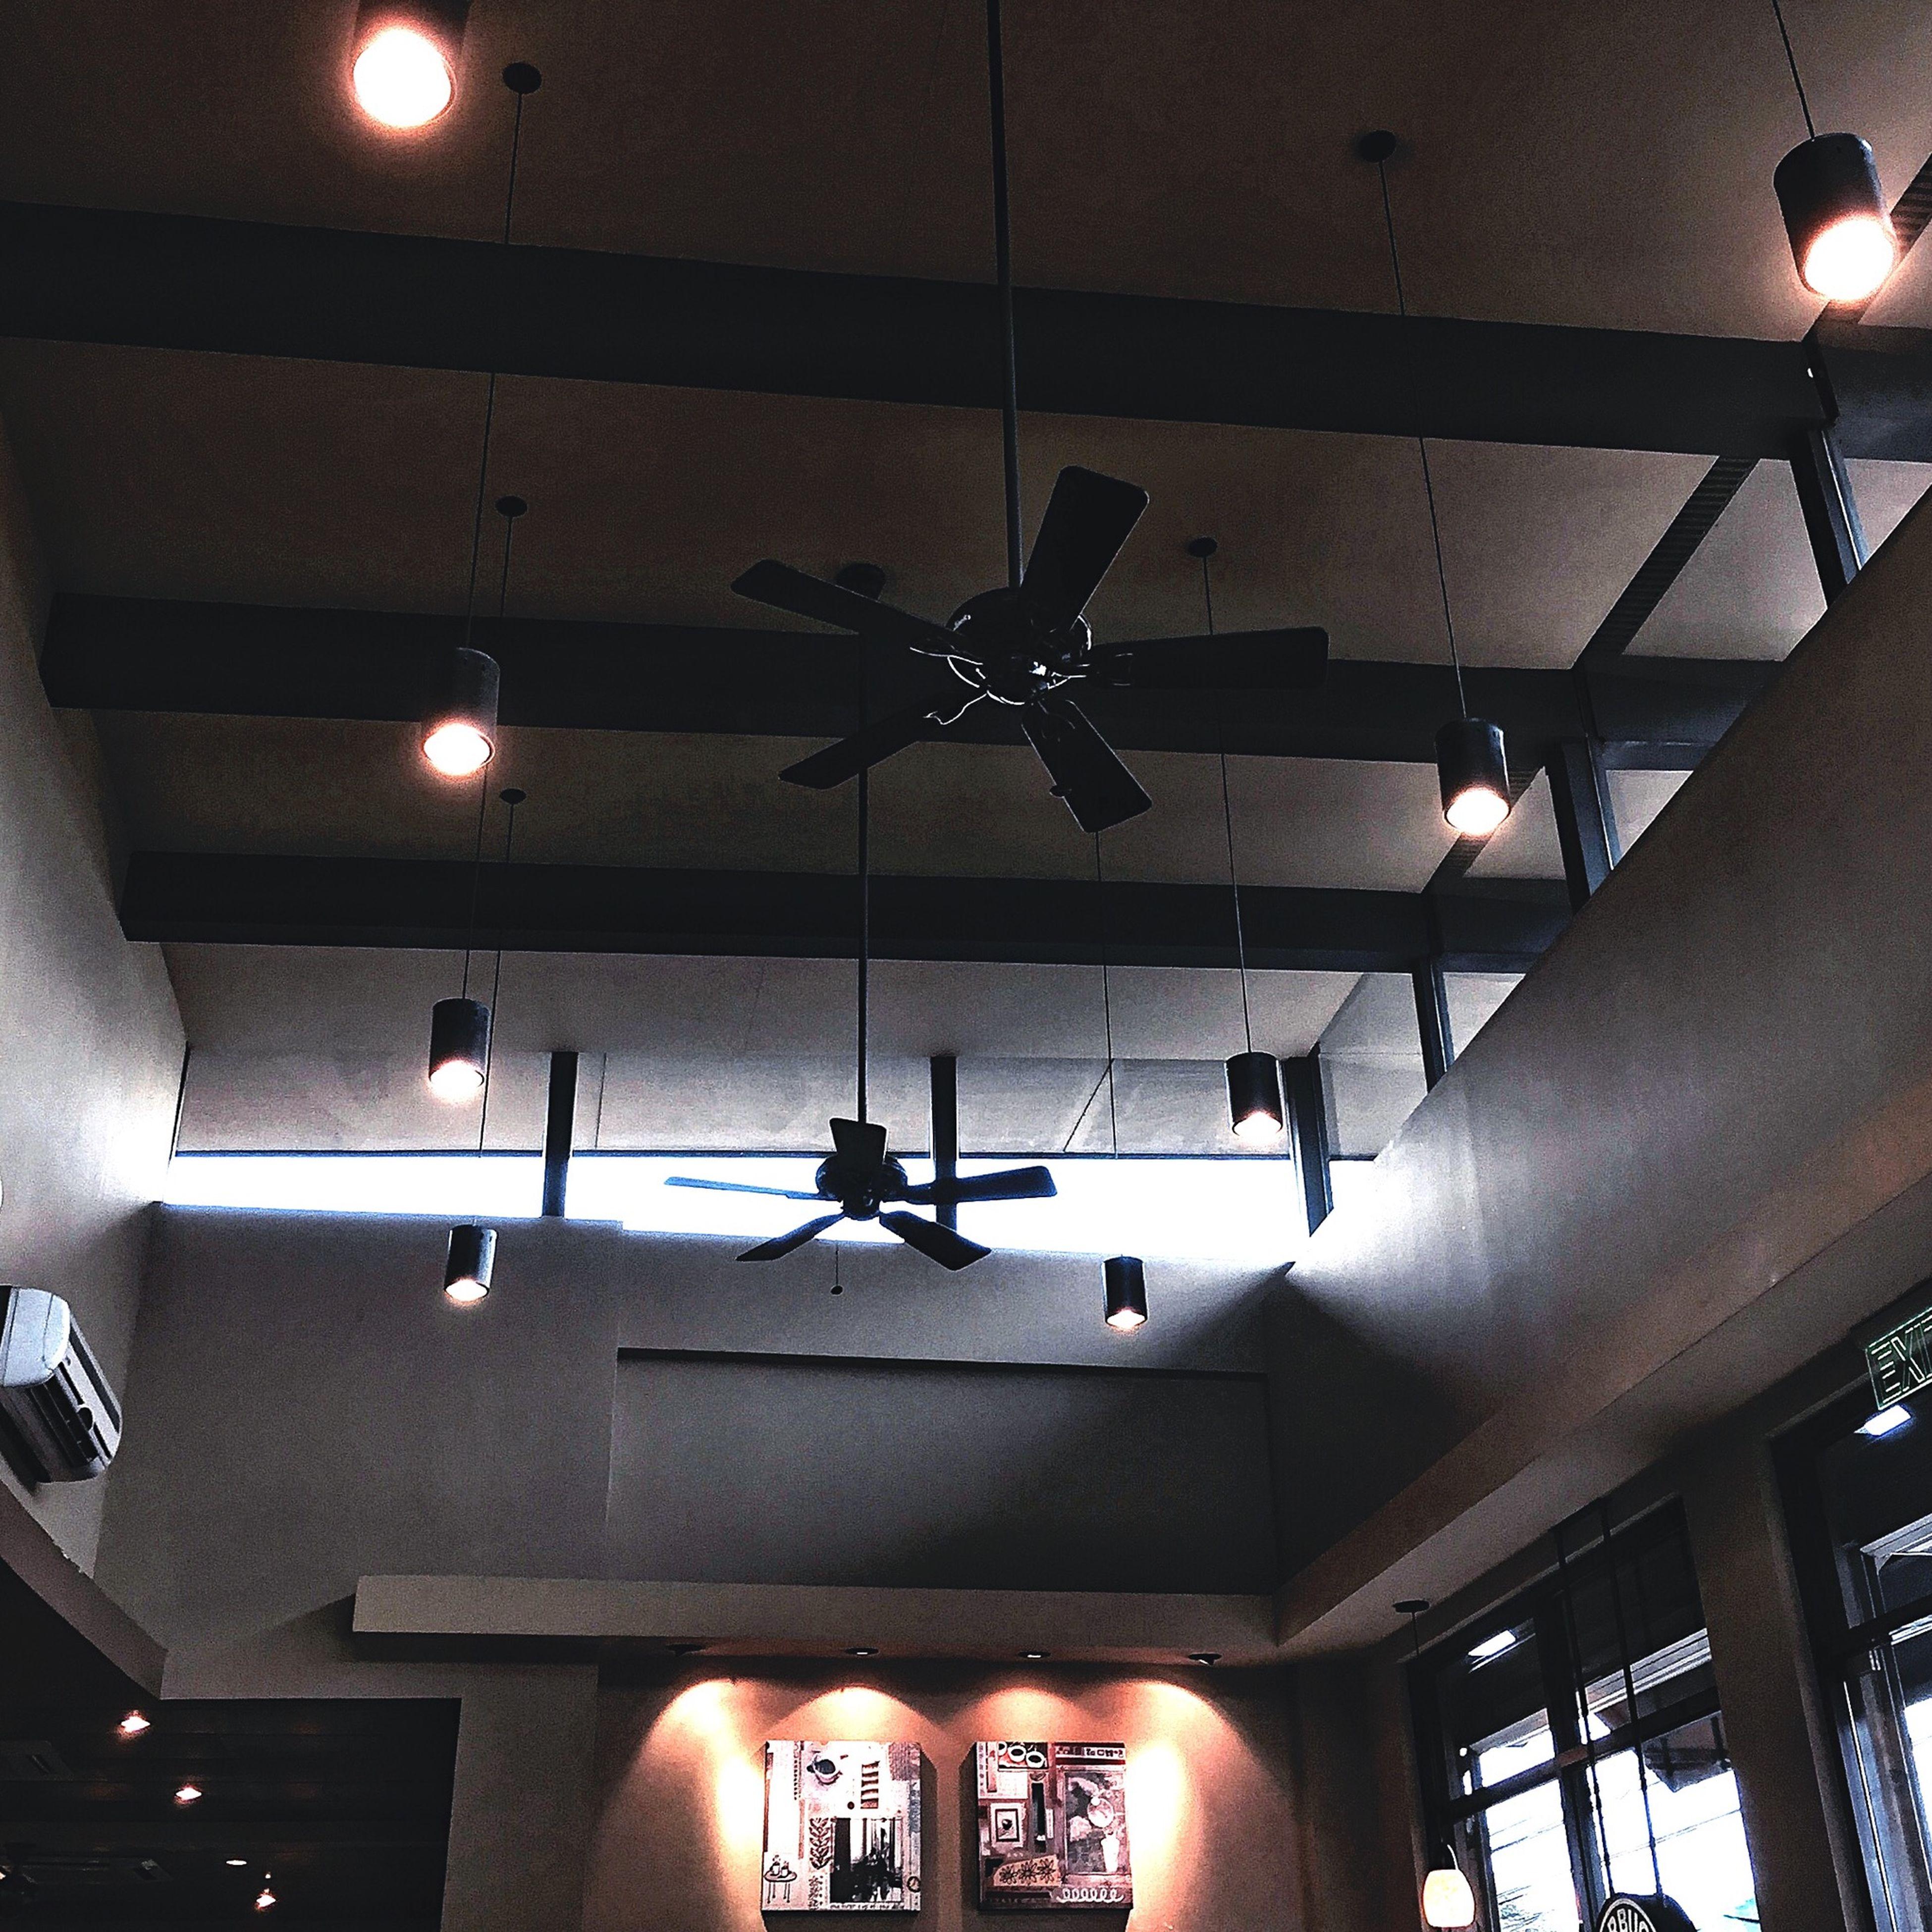 indoors, illuminated, lighting equipment, ceiling, low angle view, hanging, electricity, architecture, electric lamp, electric light, built structure, light bulb, lamp, night, light - natural phenomenon, technology, lantern, pendant light, lit, light fixture